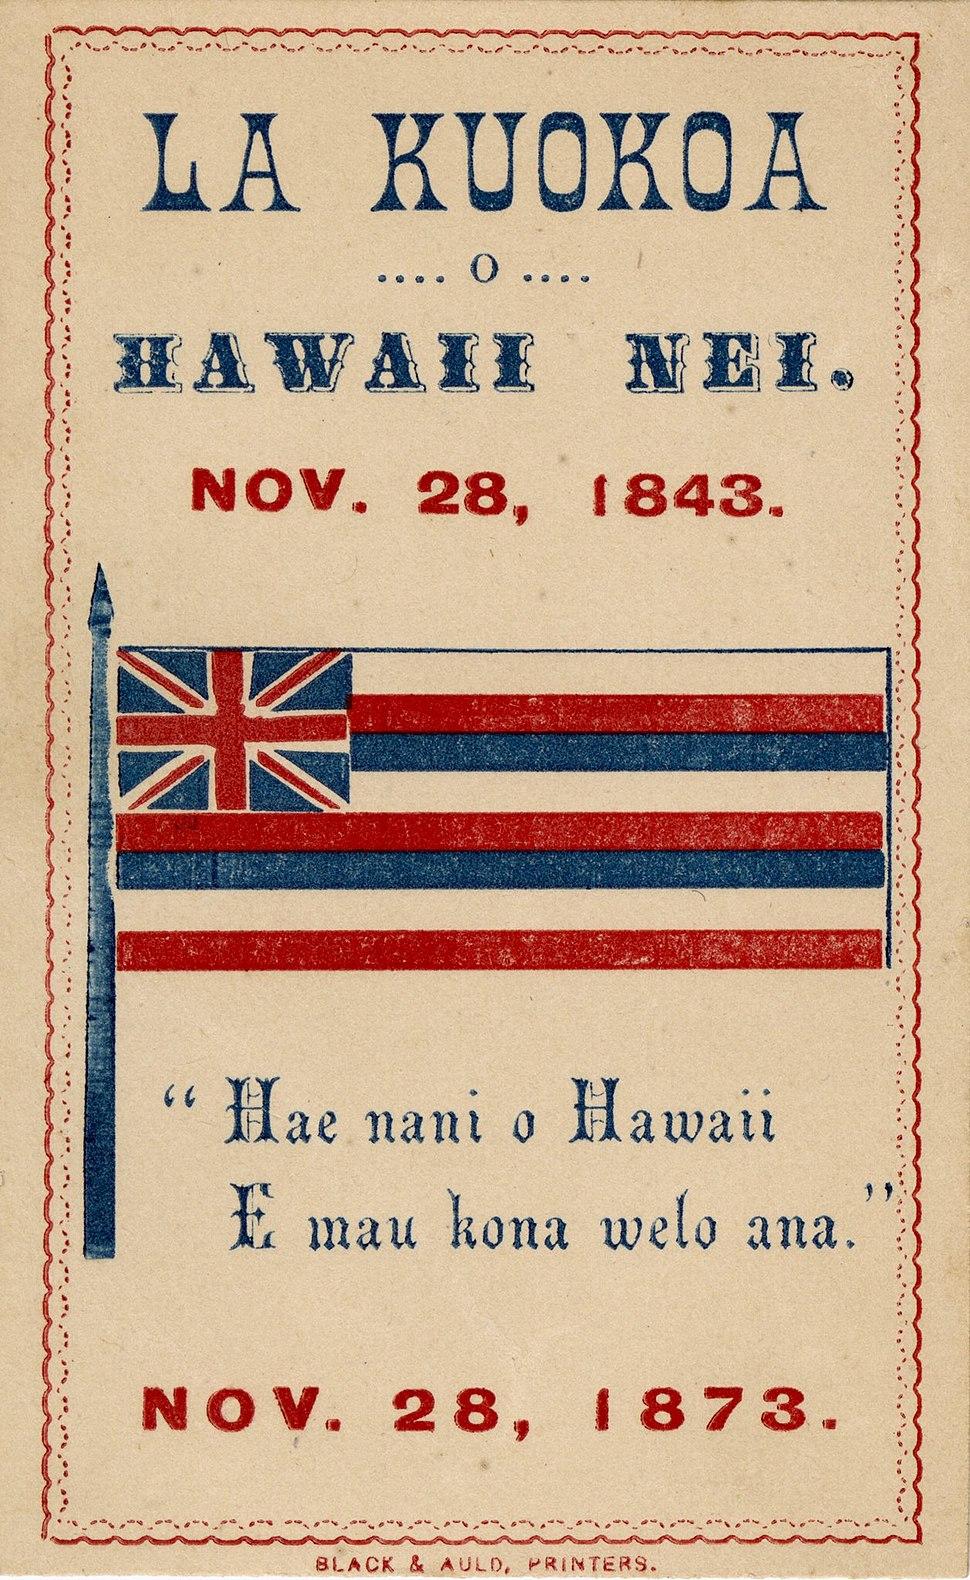 La Kuokoa o Hawaii Nei